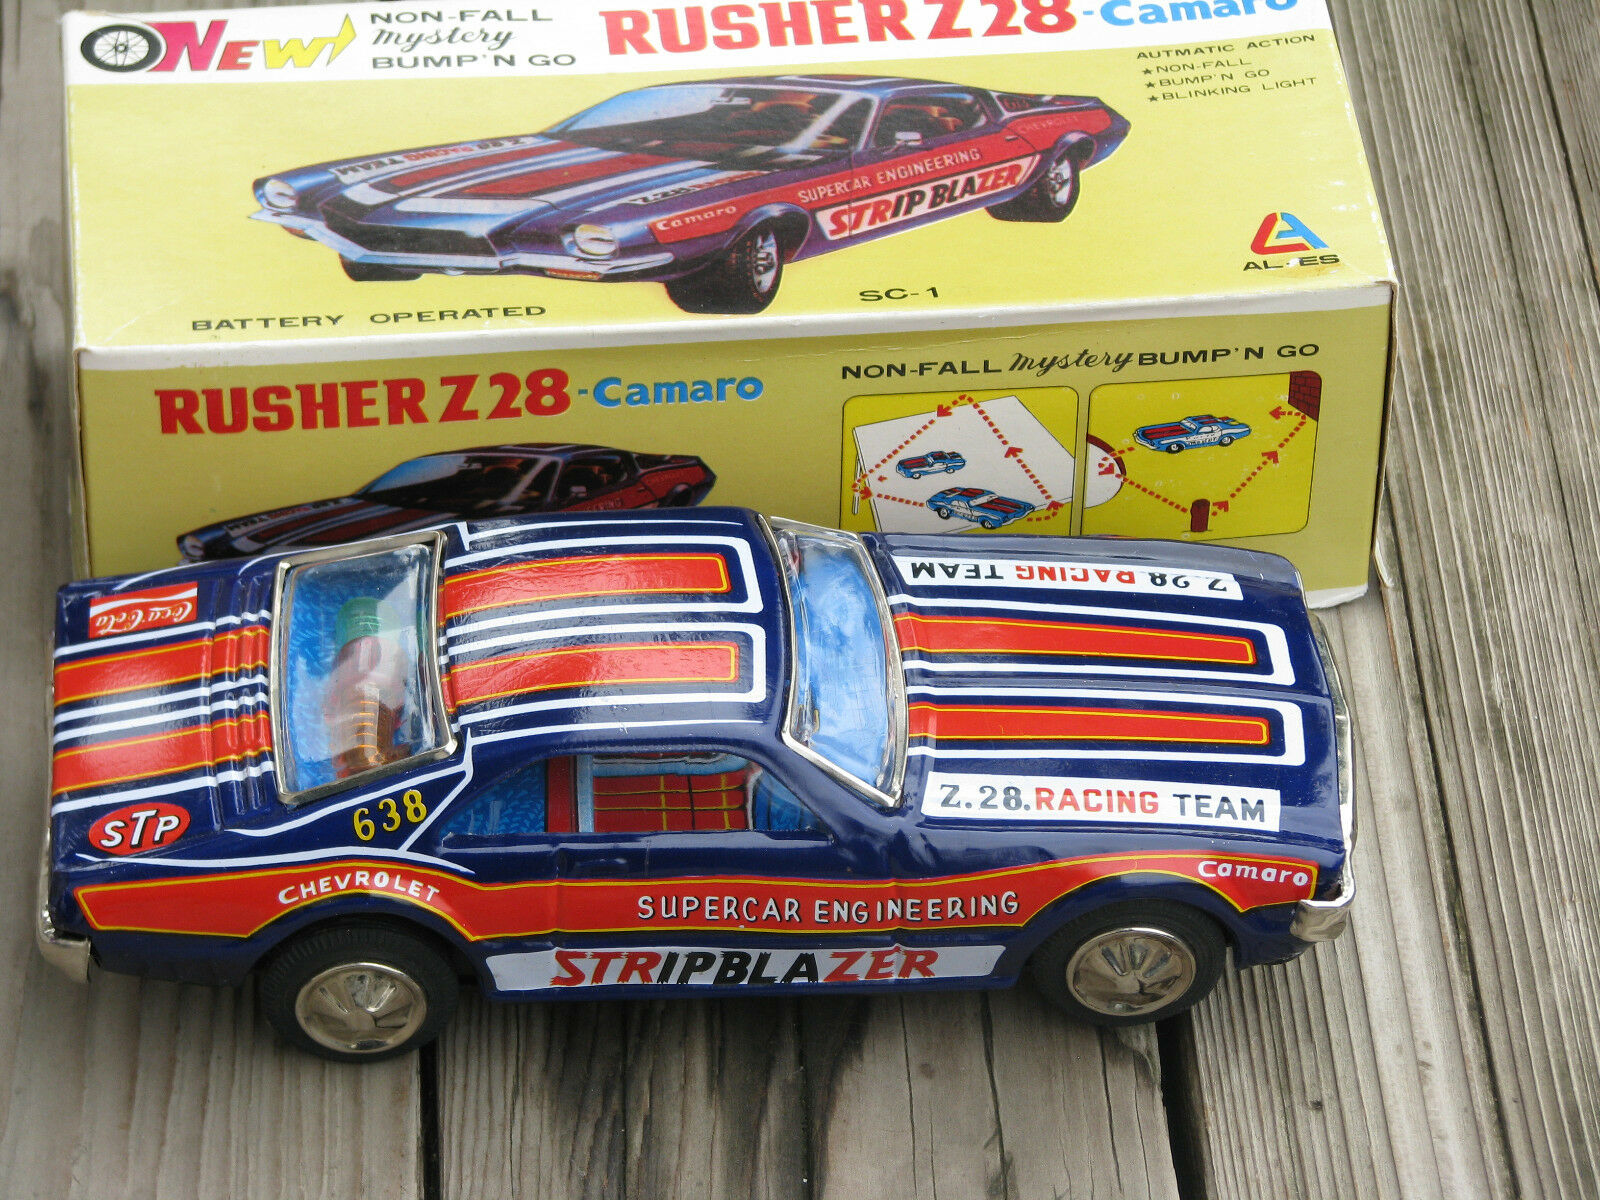 TAIYO Vintage 1970s RUSHER Z28 CAMARO 10  Car SC-1 Battery Operated 638  JAPAN